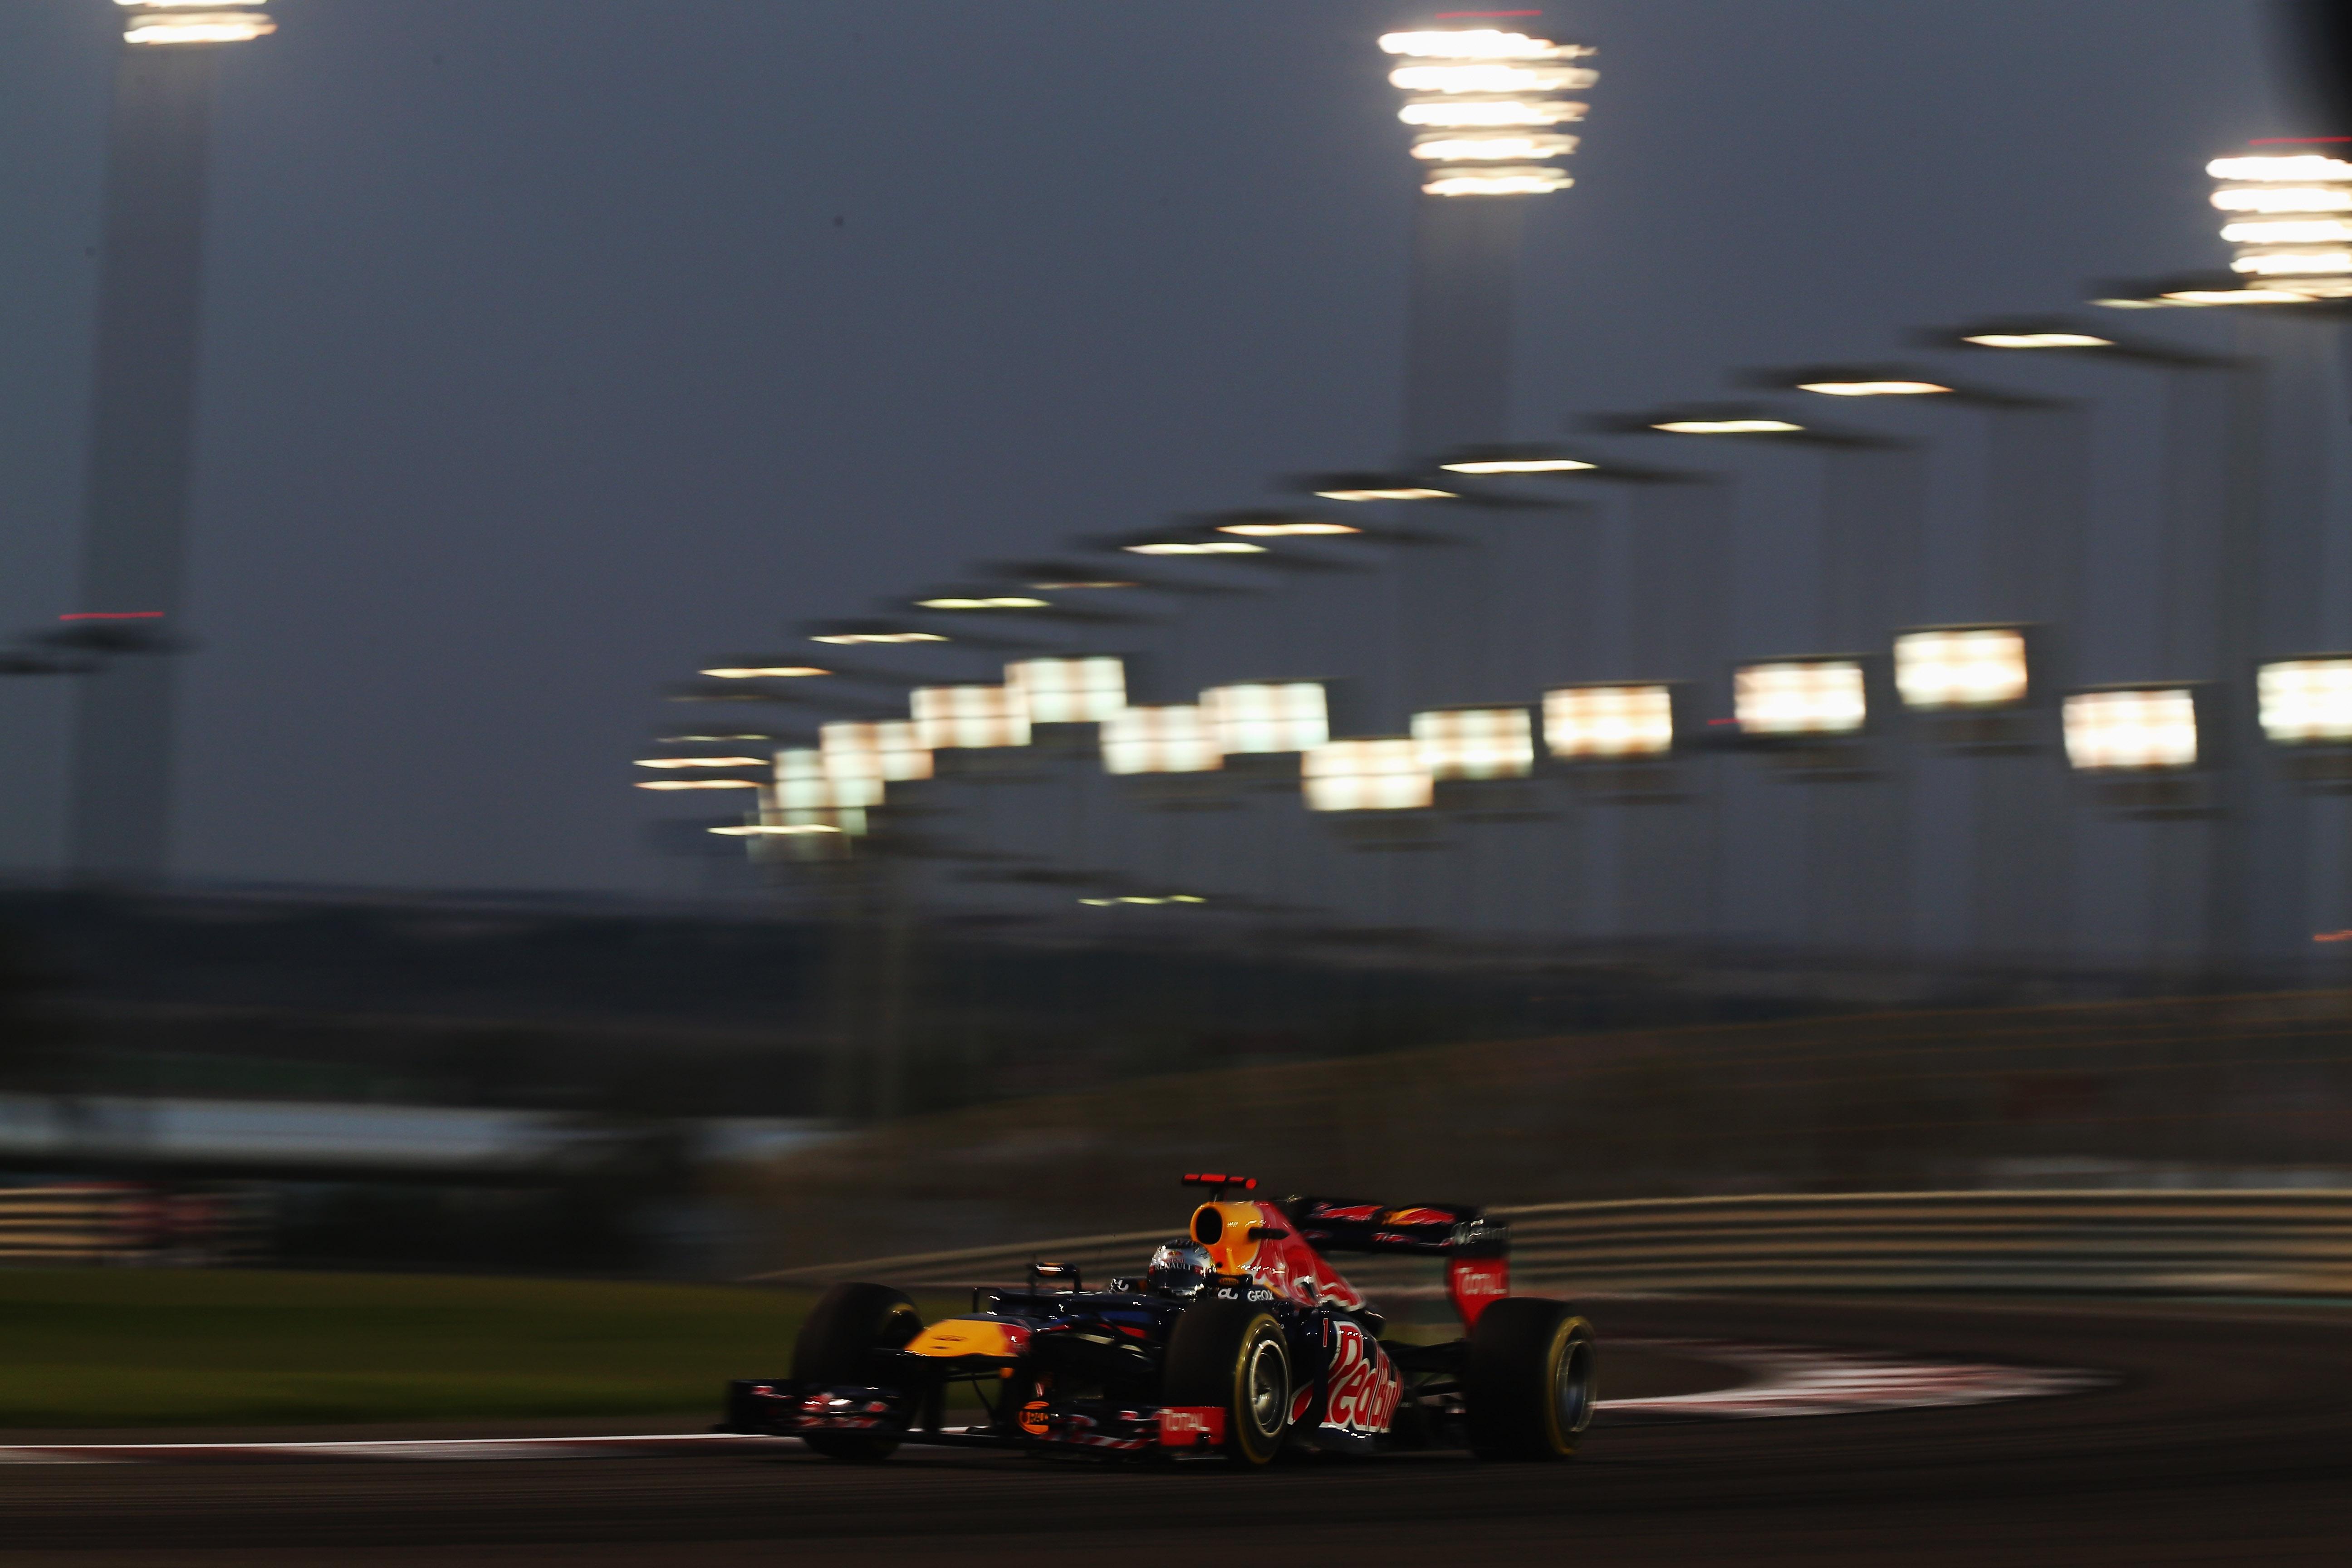 Abu Dhabi wants F1 winter testing